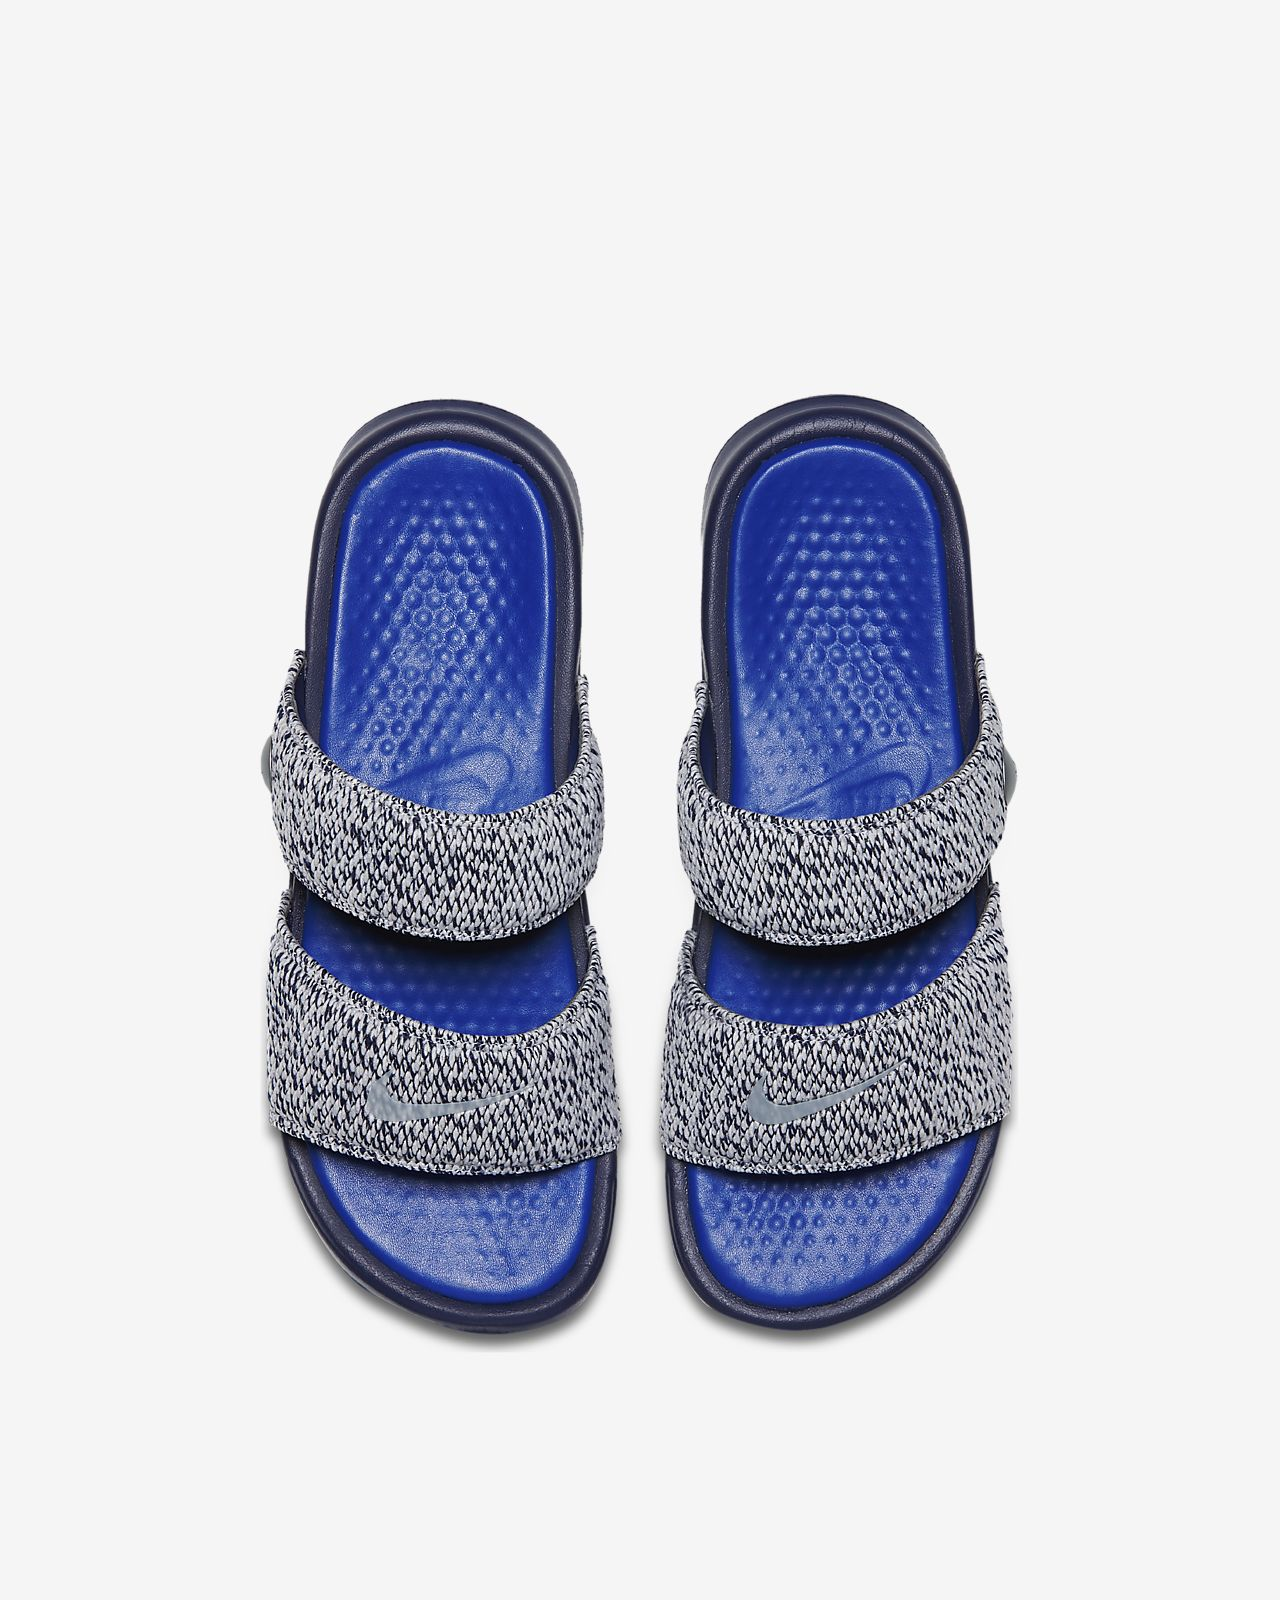 Nike Benassi Duo Ultra x Pigalle 男子拖鞋